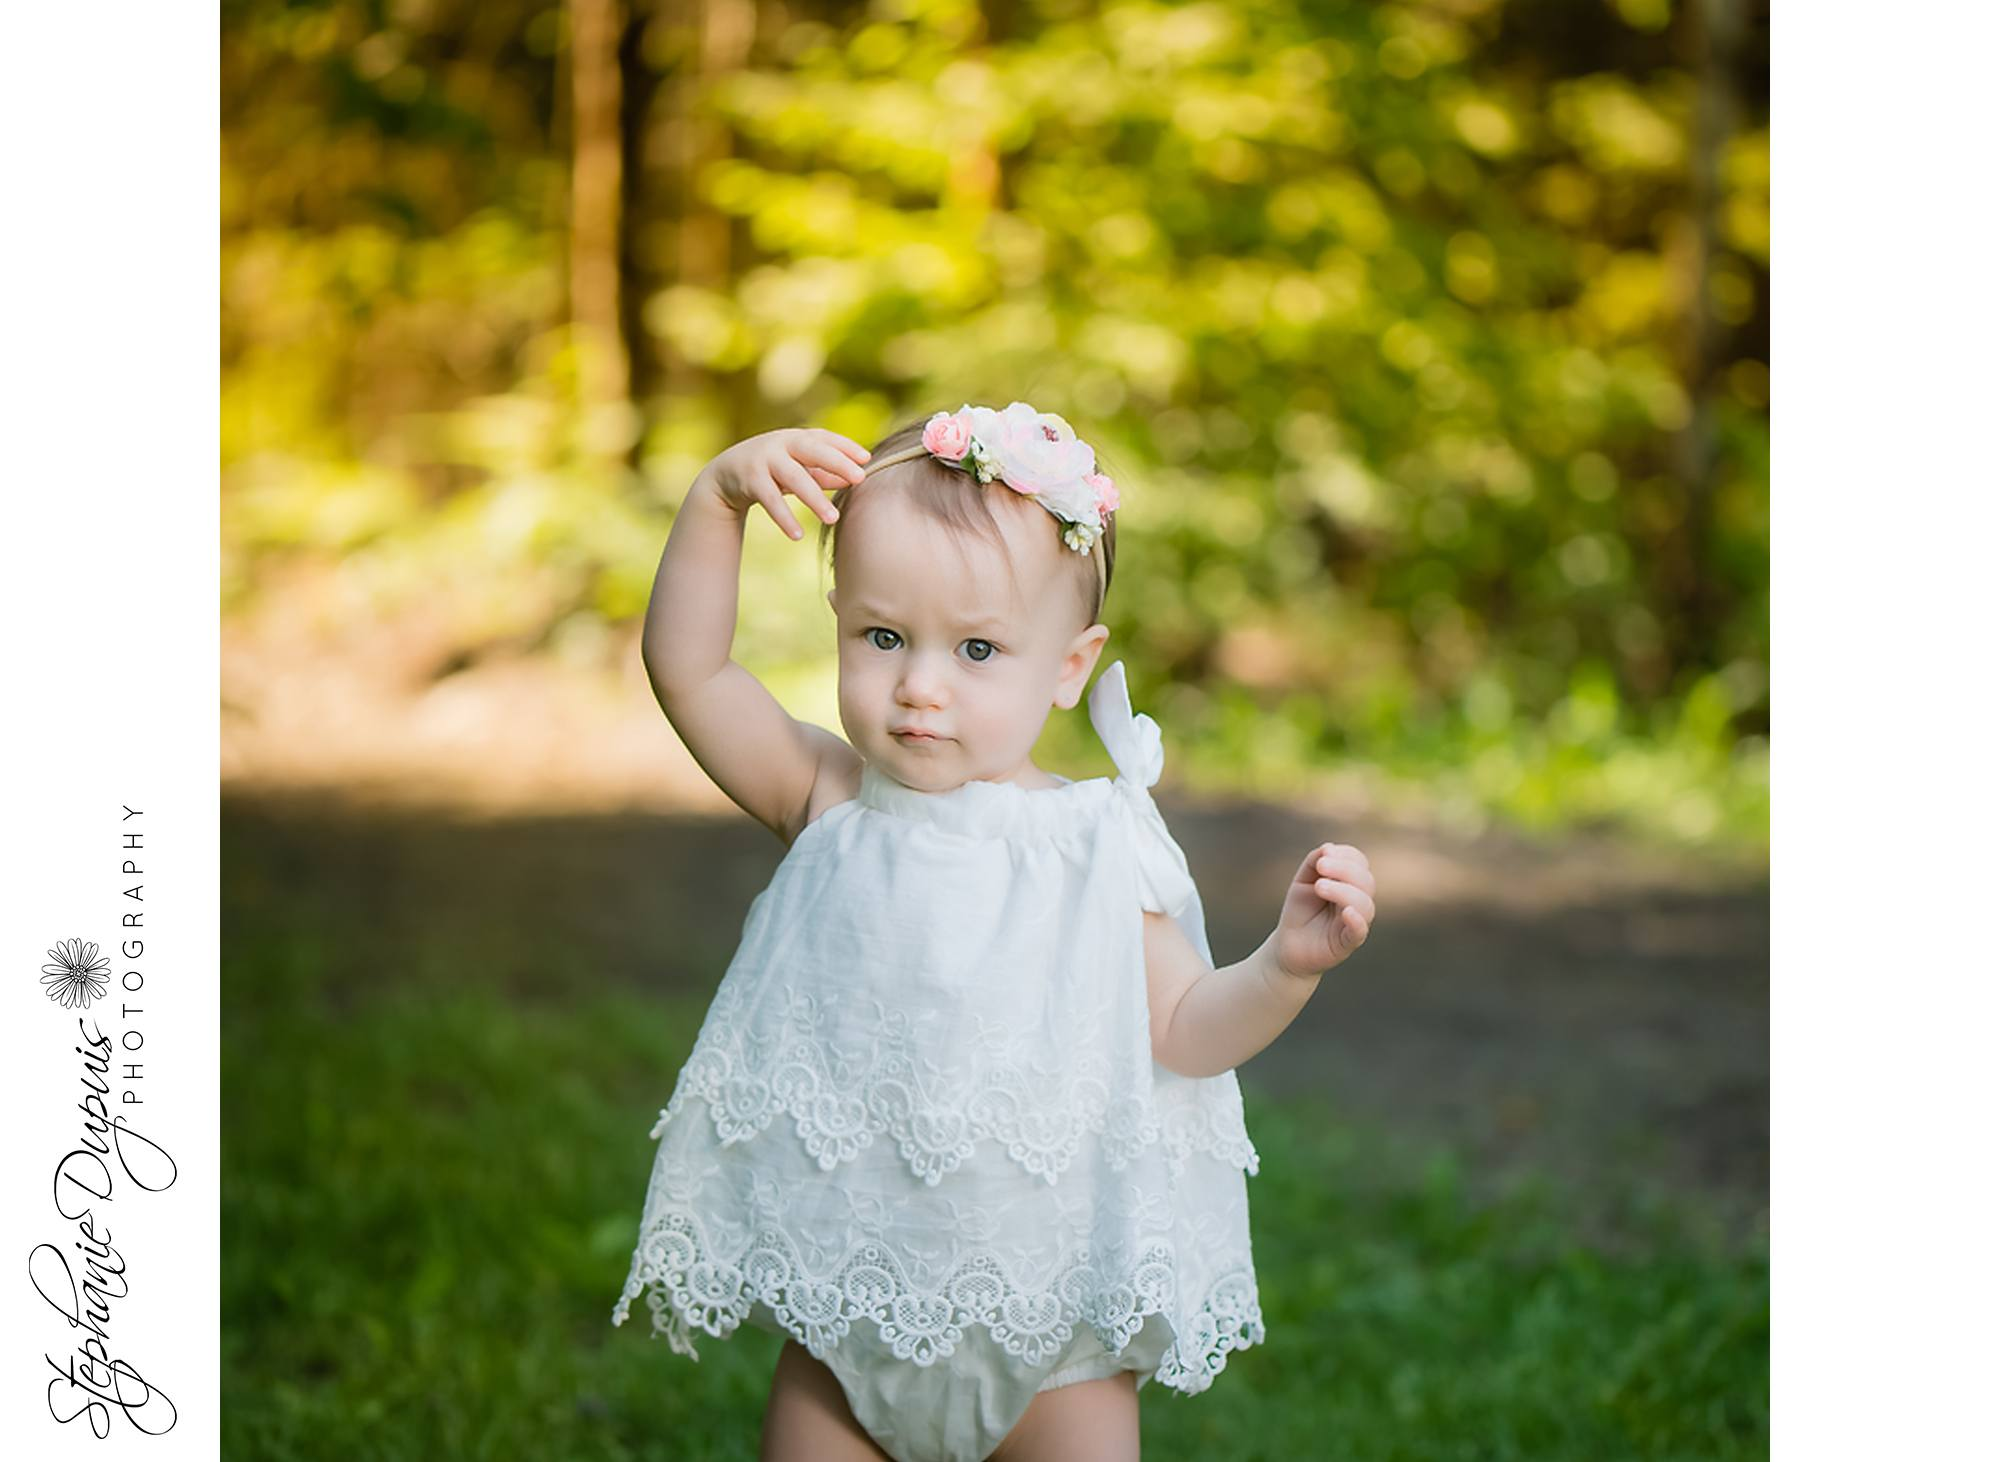 Kelly Jo 3 e - Portfolio: Kelly Jo Infant Session